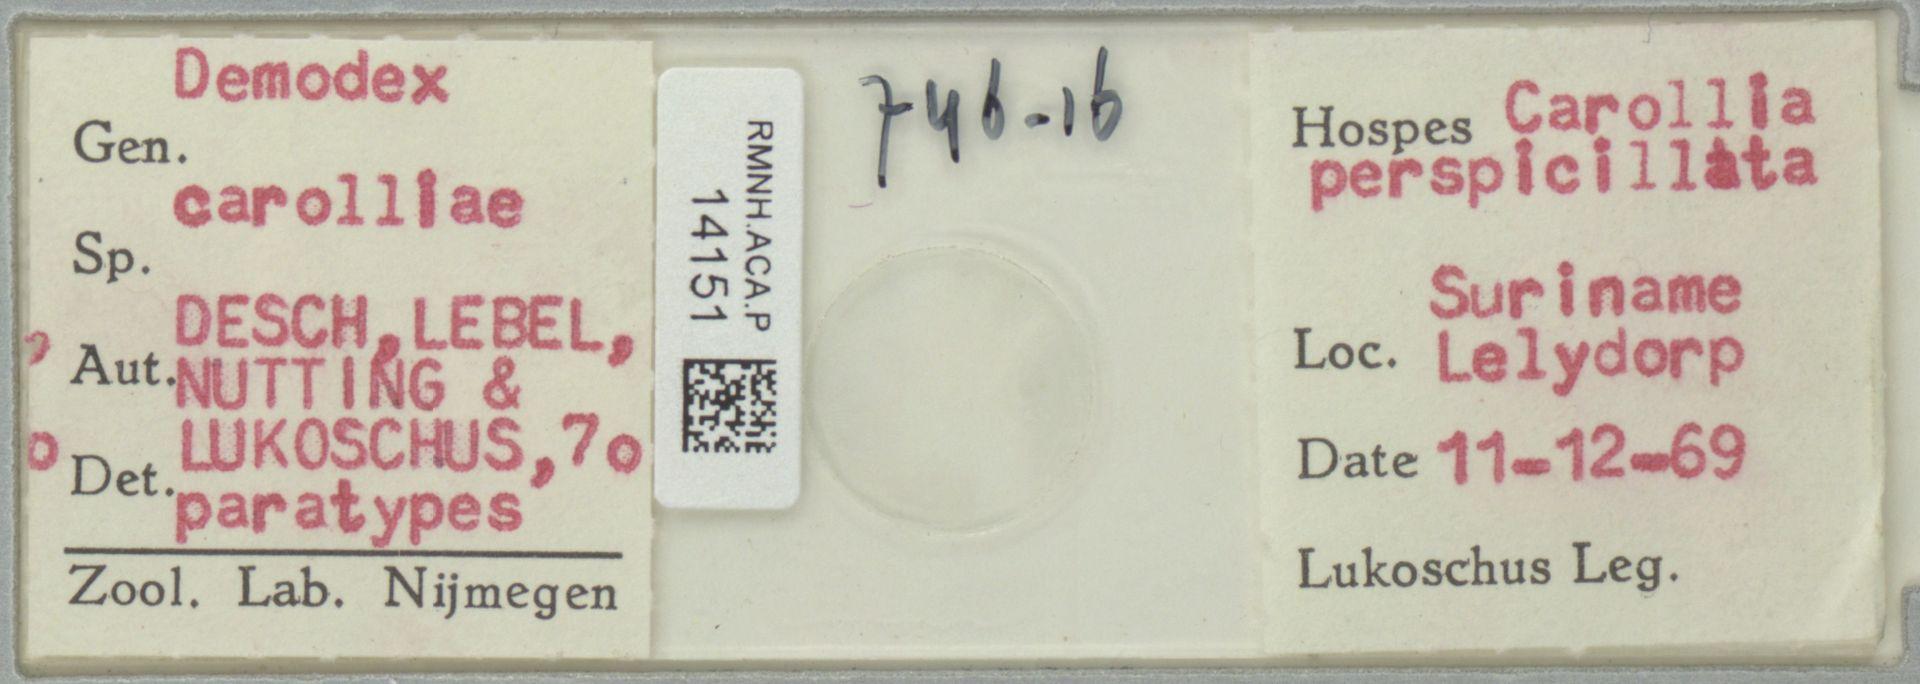 RMNH.ACA.P.14151 | Demodex carolliae